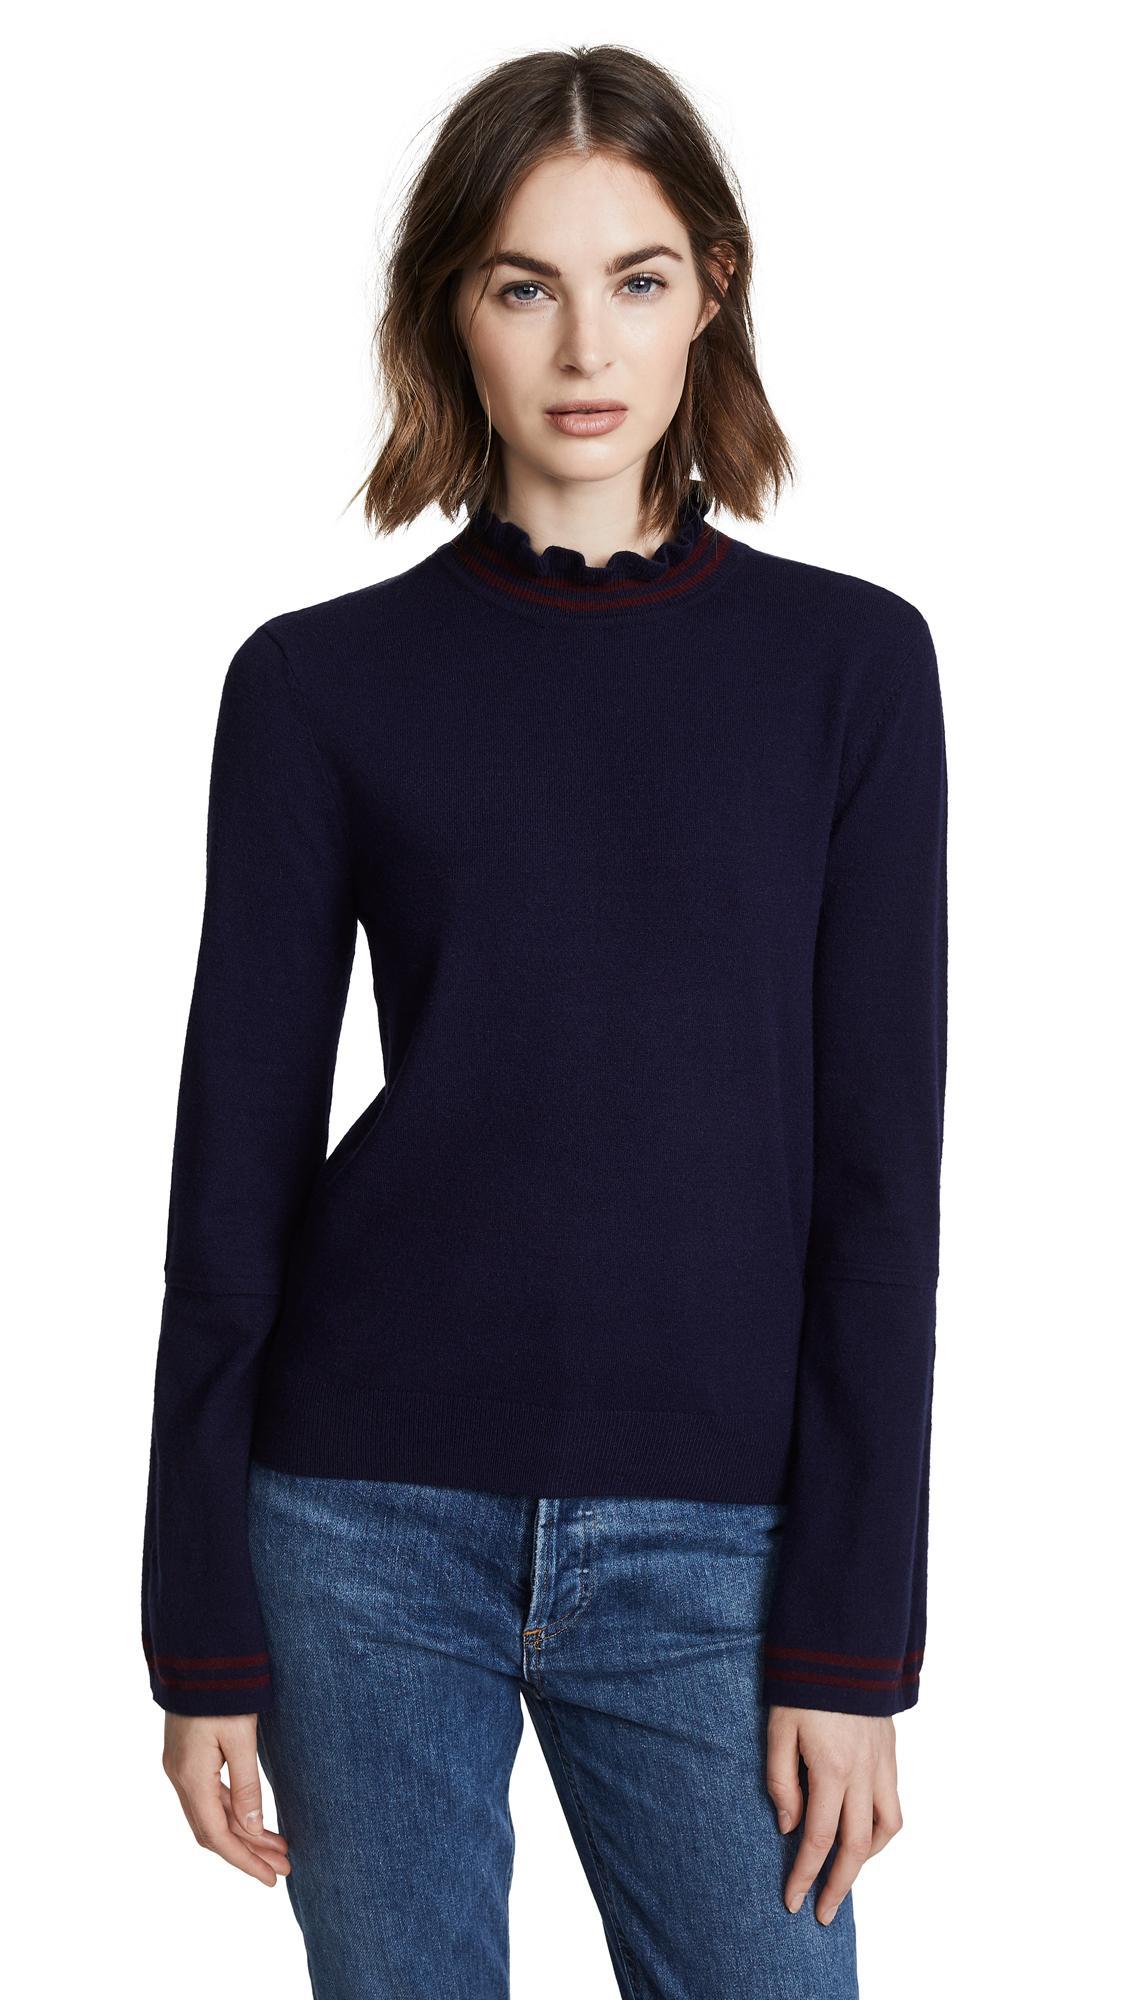 b5c7815dd92 Bb Dakota Lost In Translation Sweater In Midnight Sky